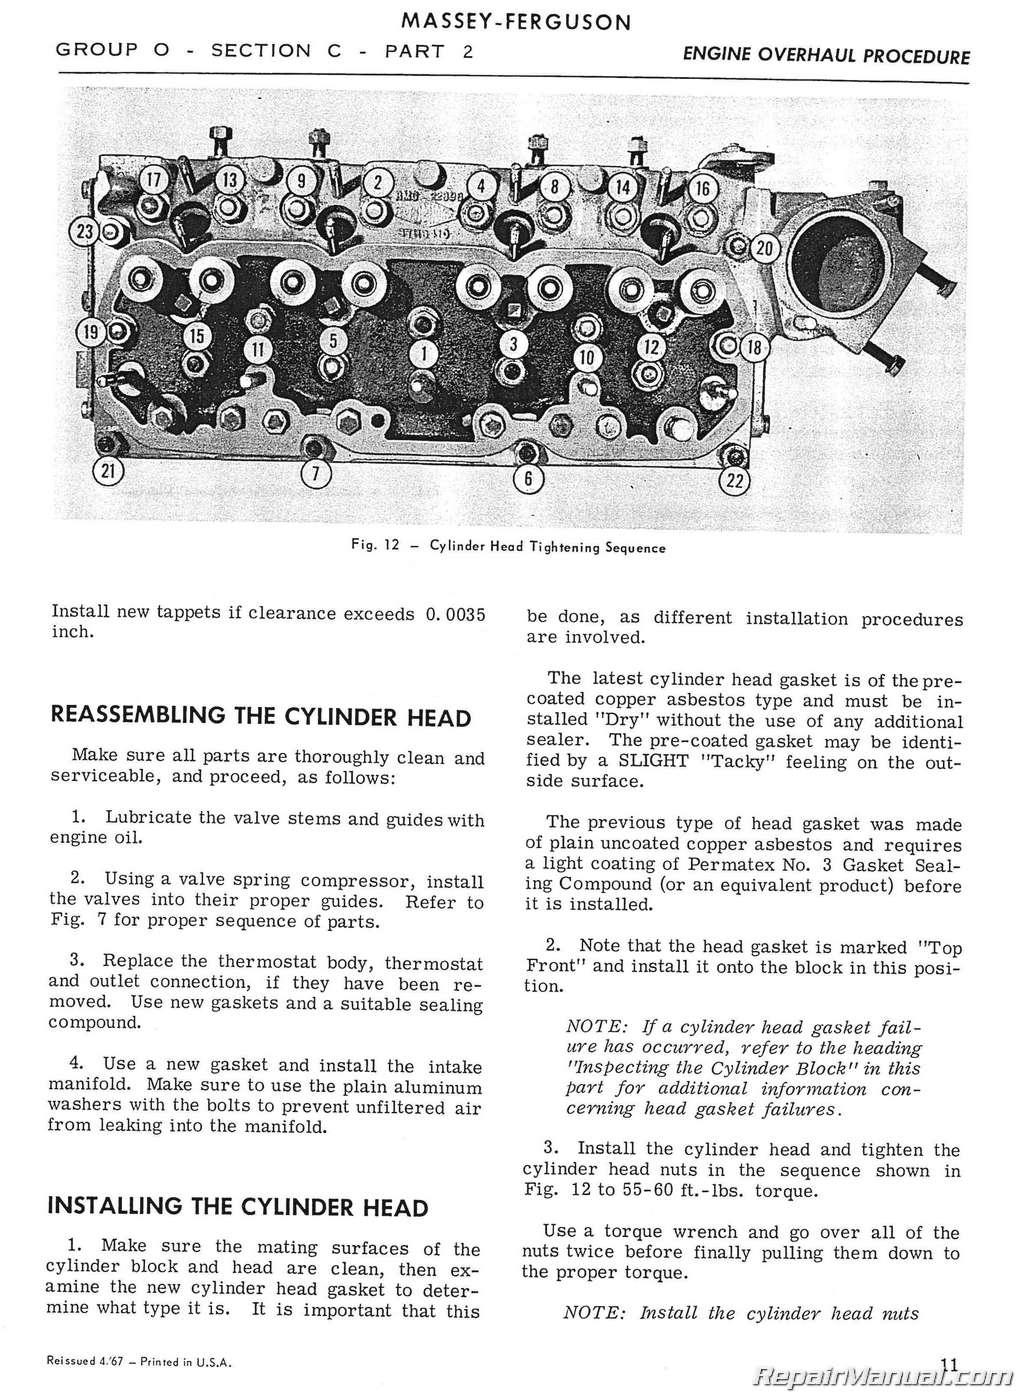 Massey Ferguson MF 302 MF 304 Tractor MF 320 Backhoe Service ManualRepair Manuals Online